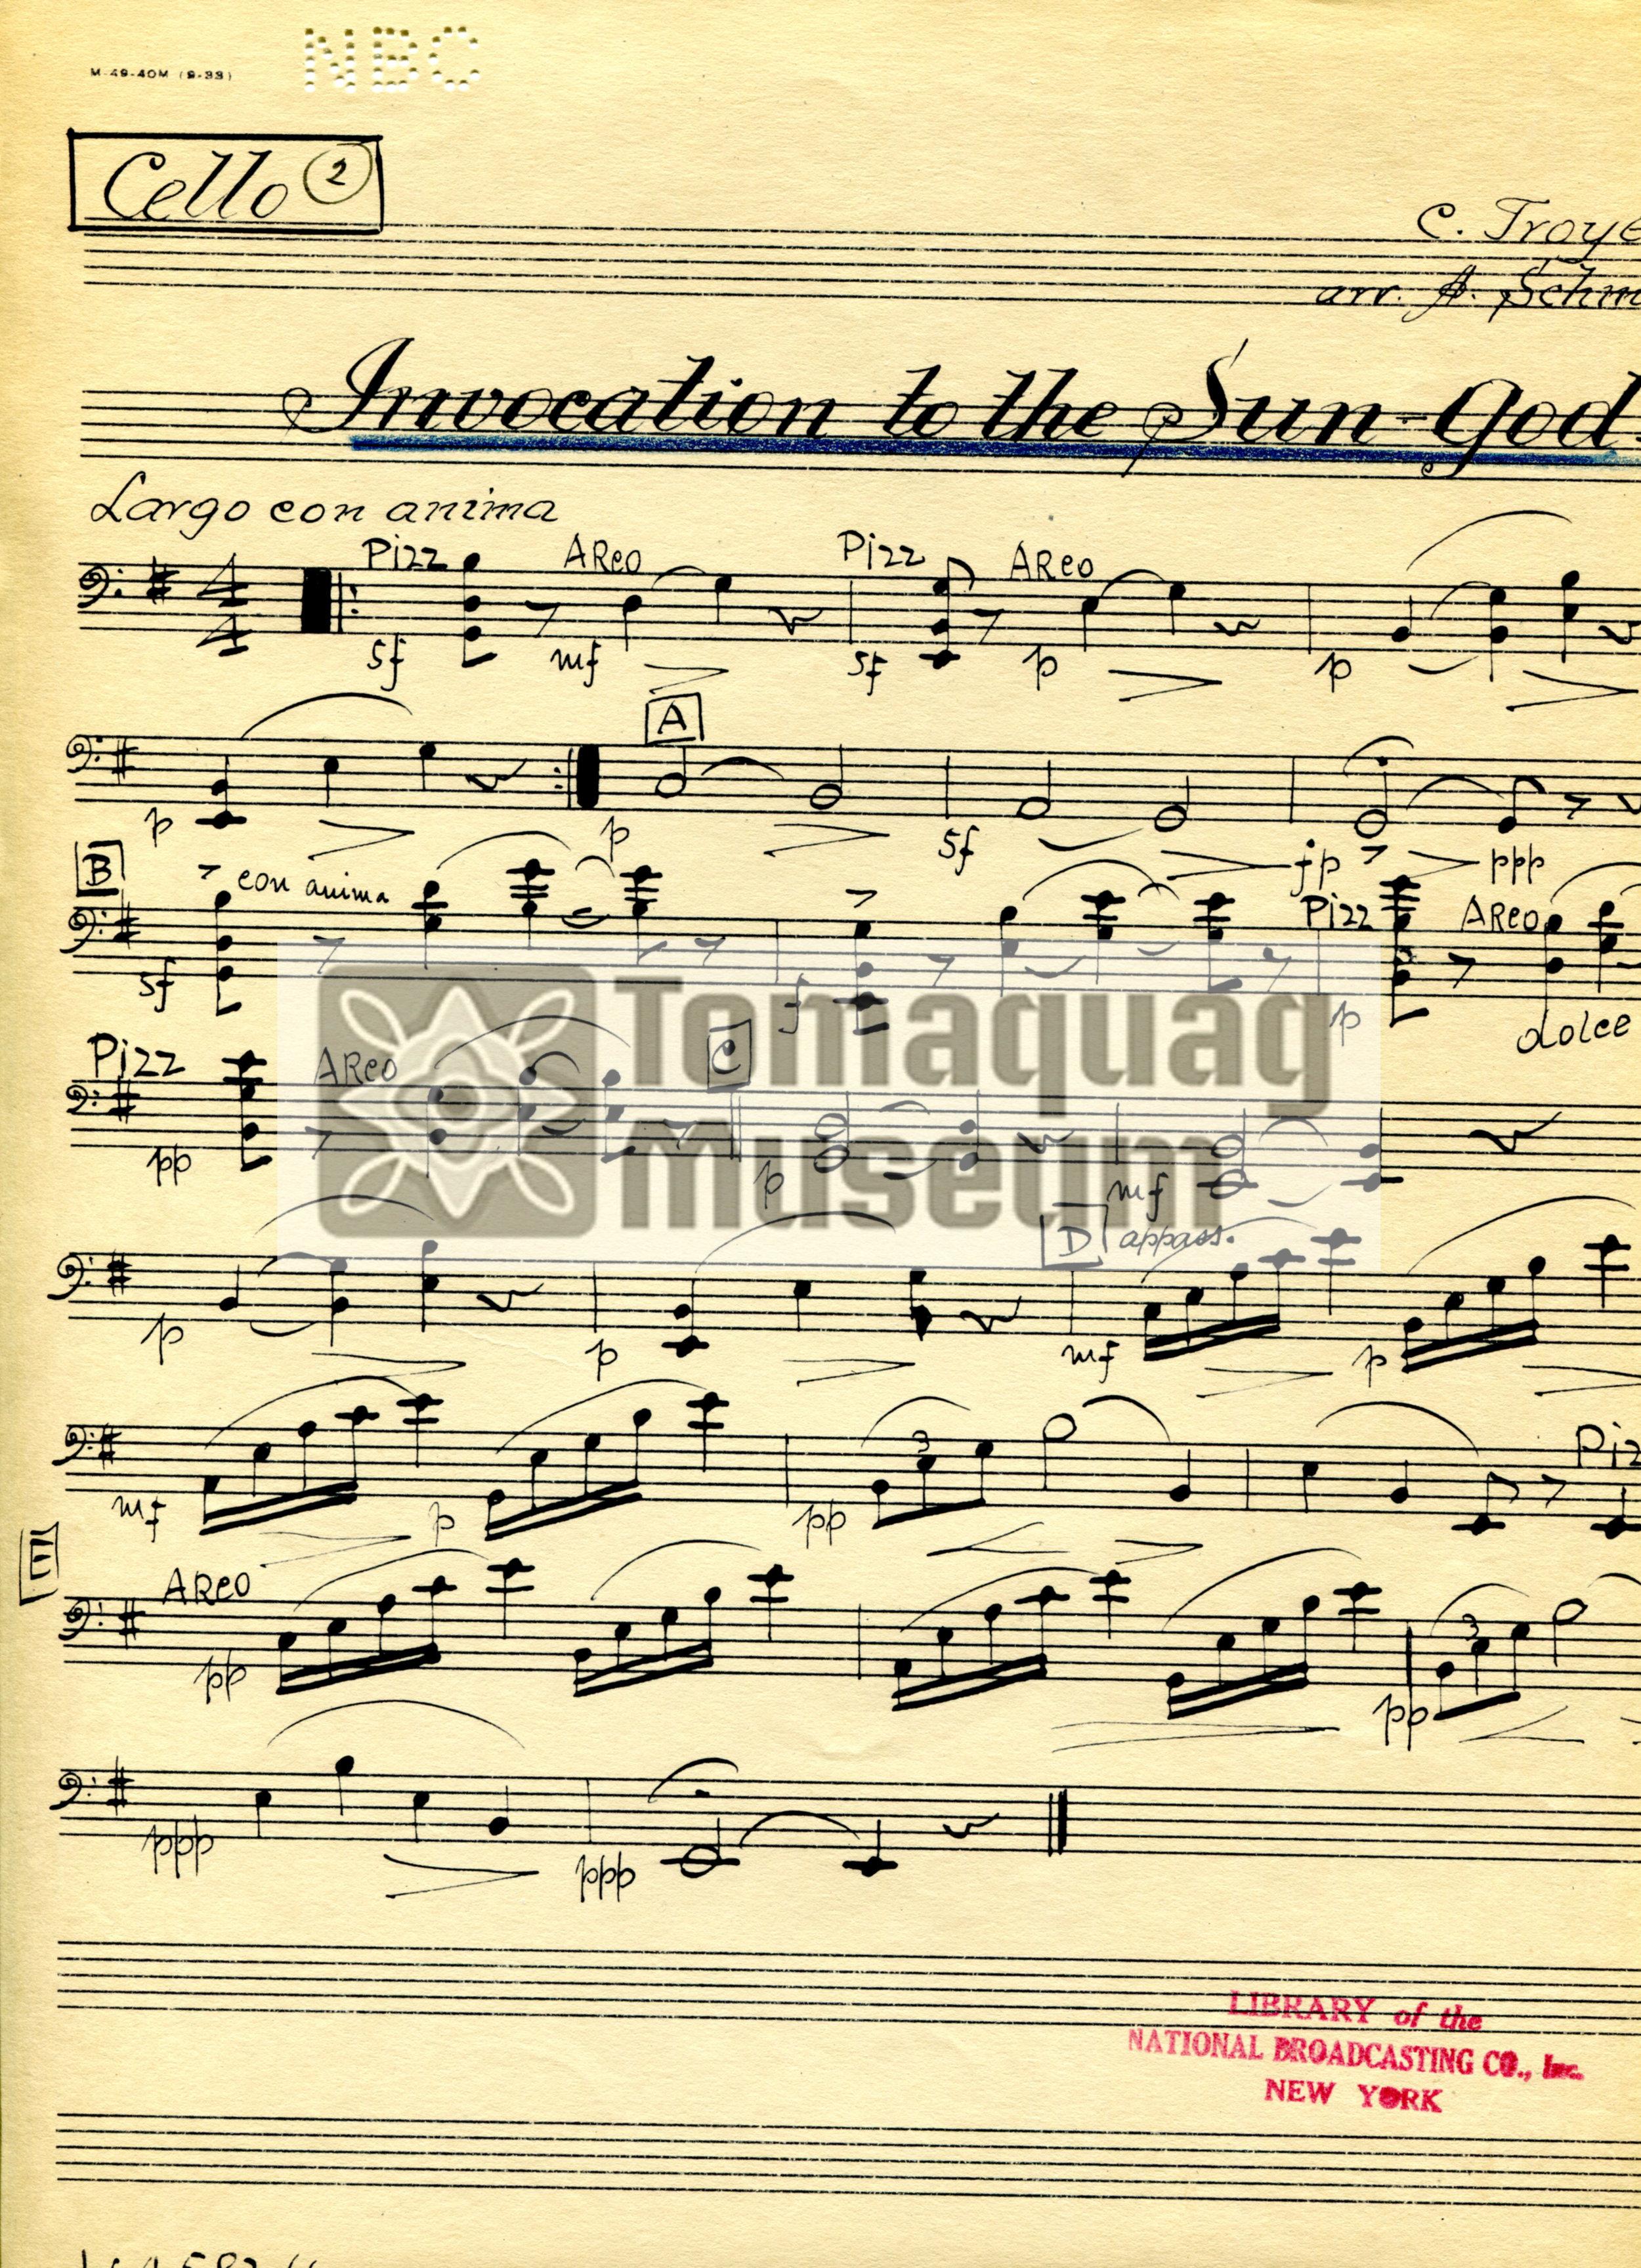 HoteCasellaInvocation of the Sun God Sheet Music Cello.jpg